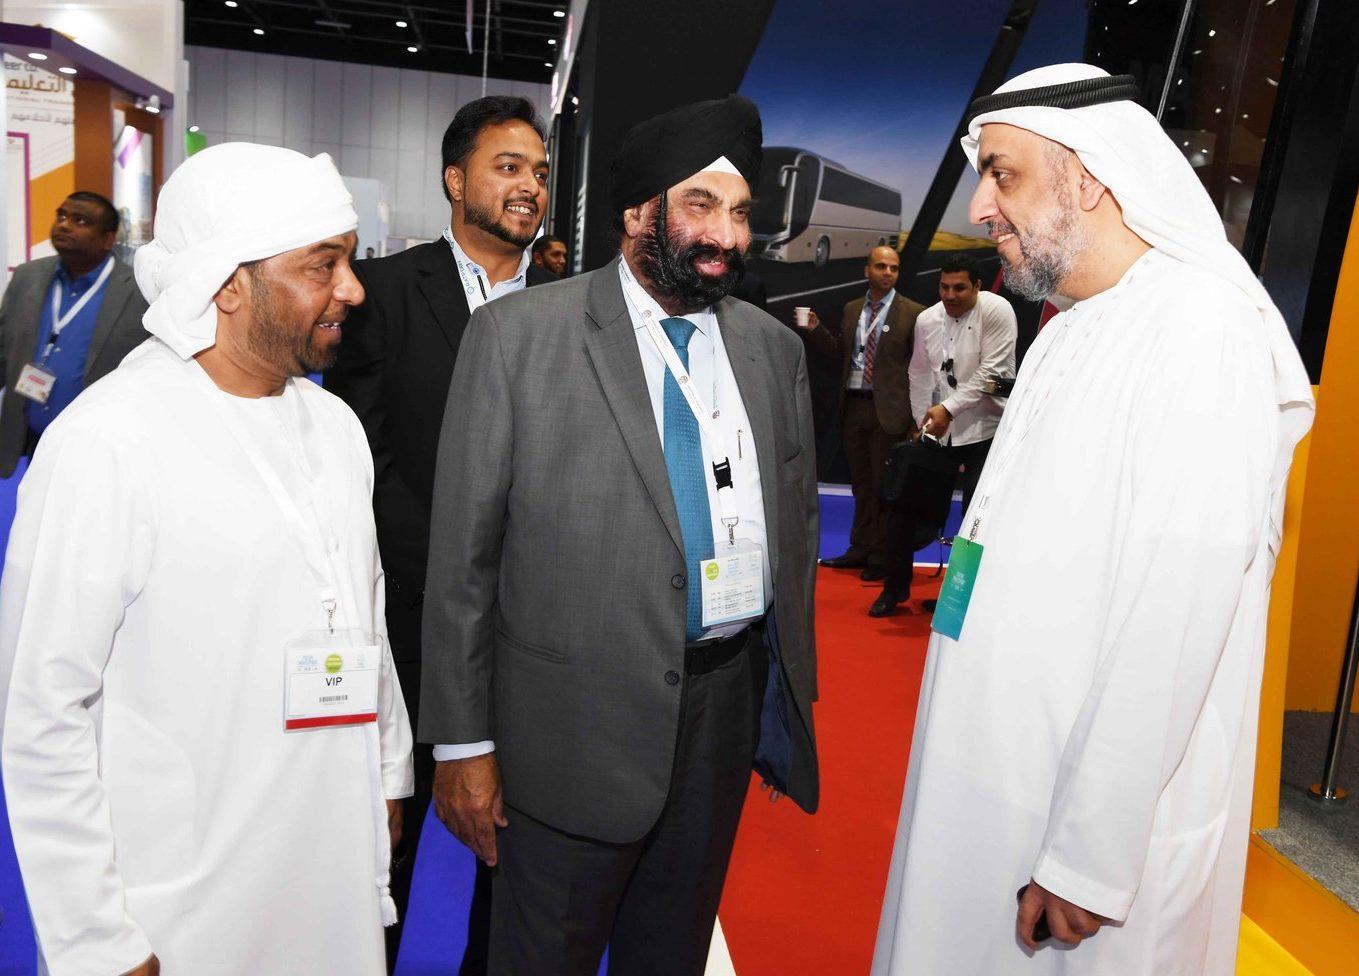 Dubai Taxi Corporation (DTC) and Al Dobowi's 15 Year Partnership